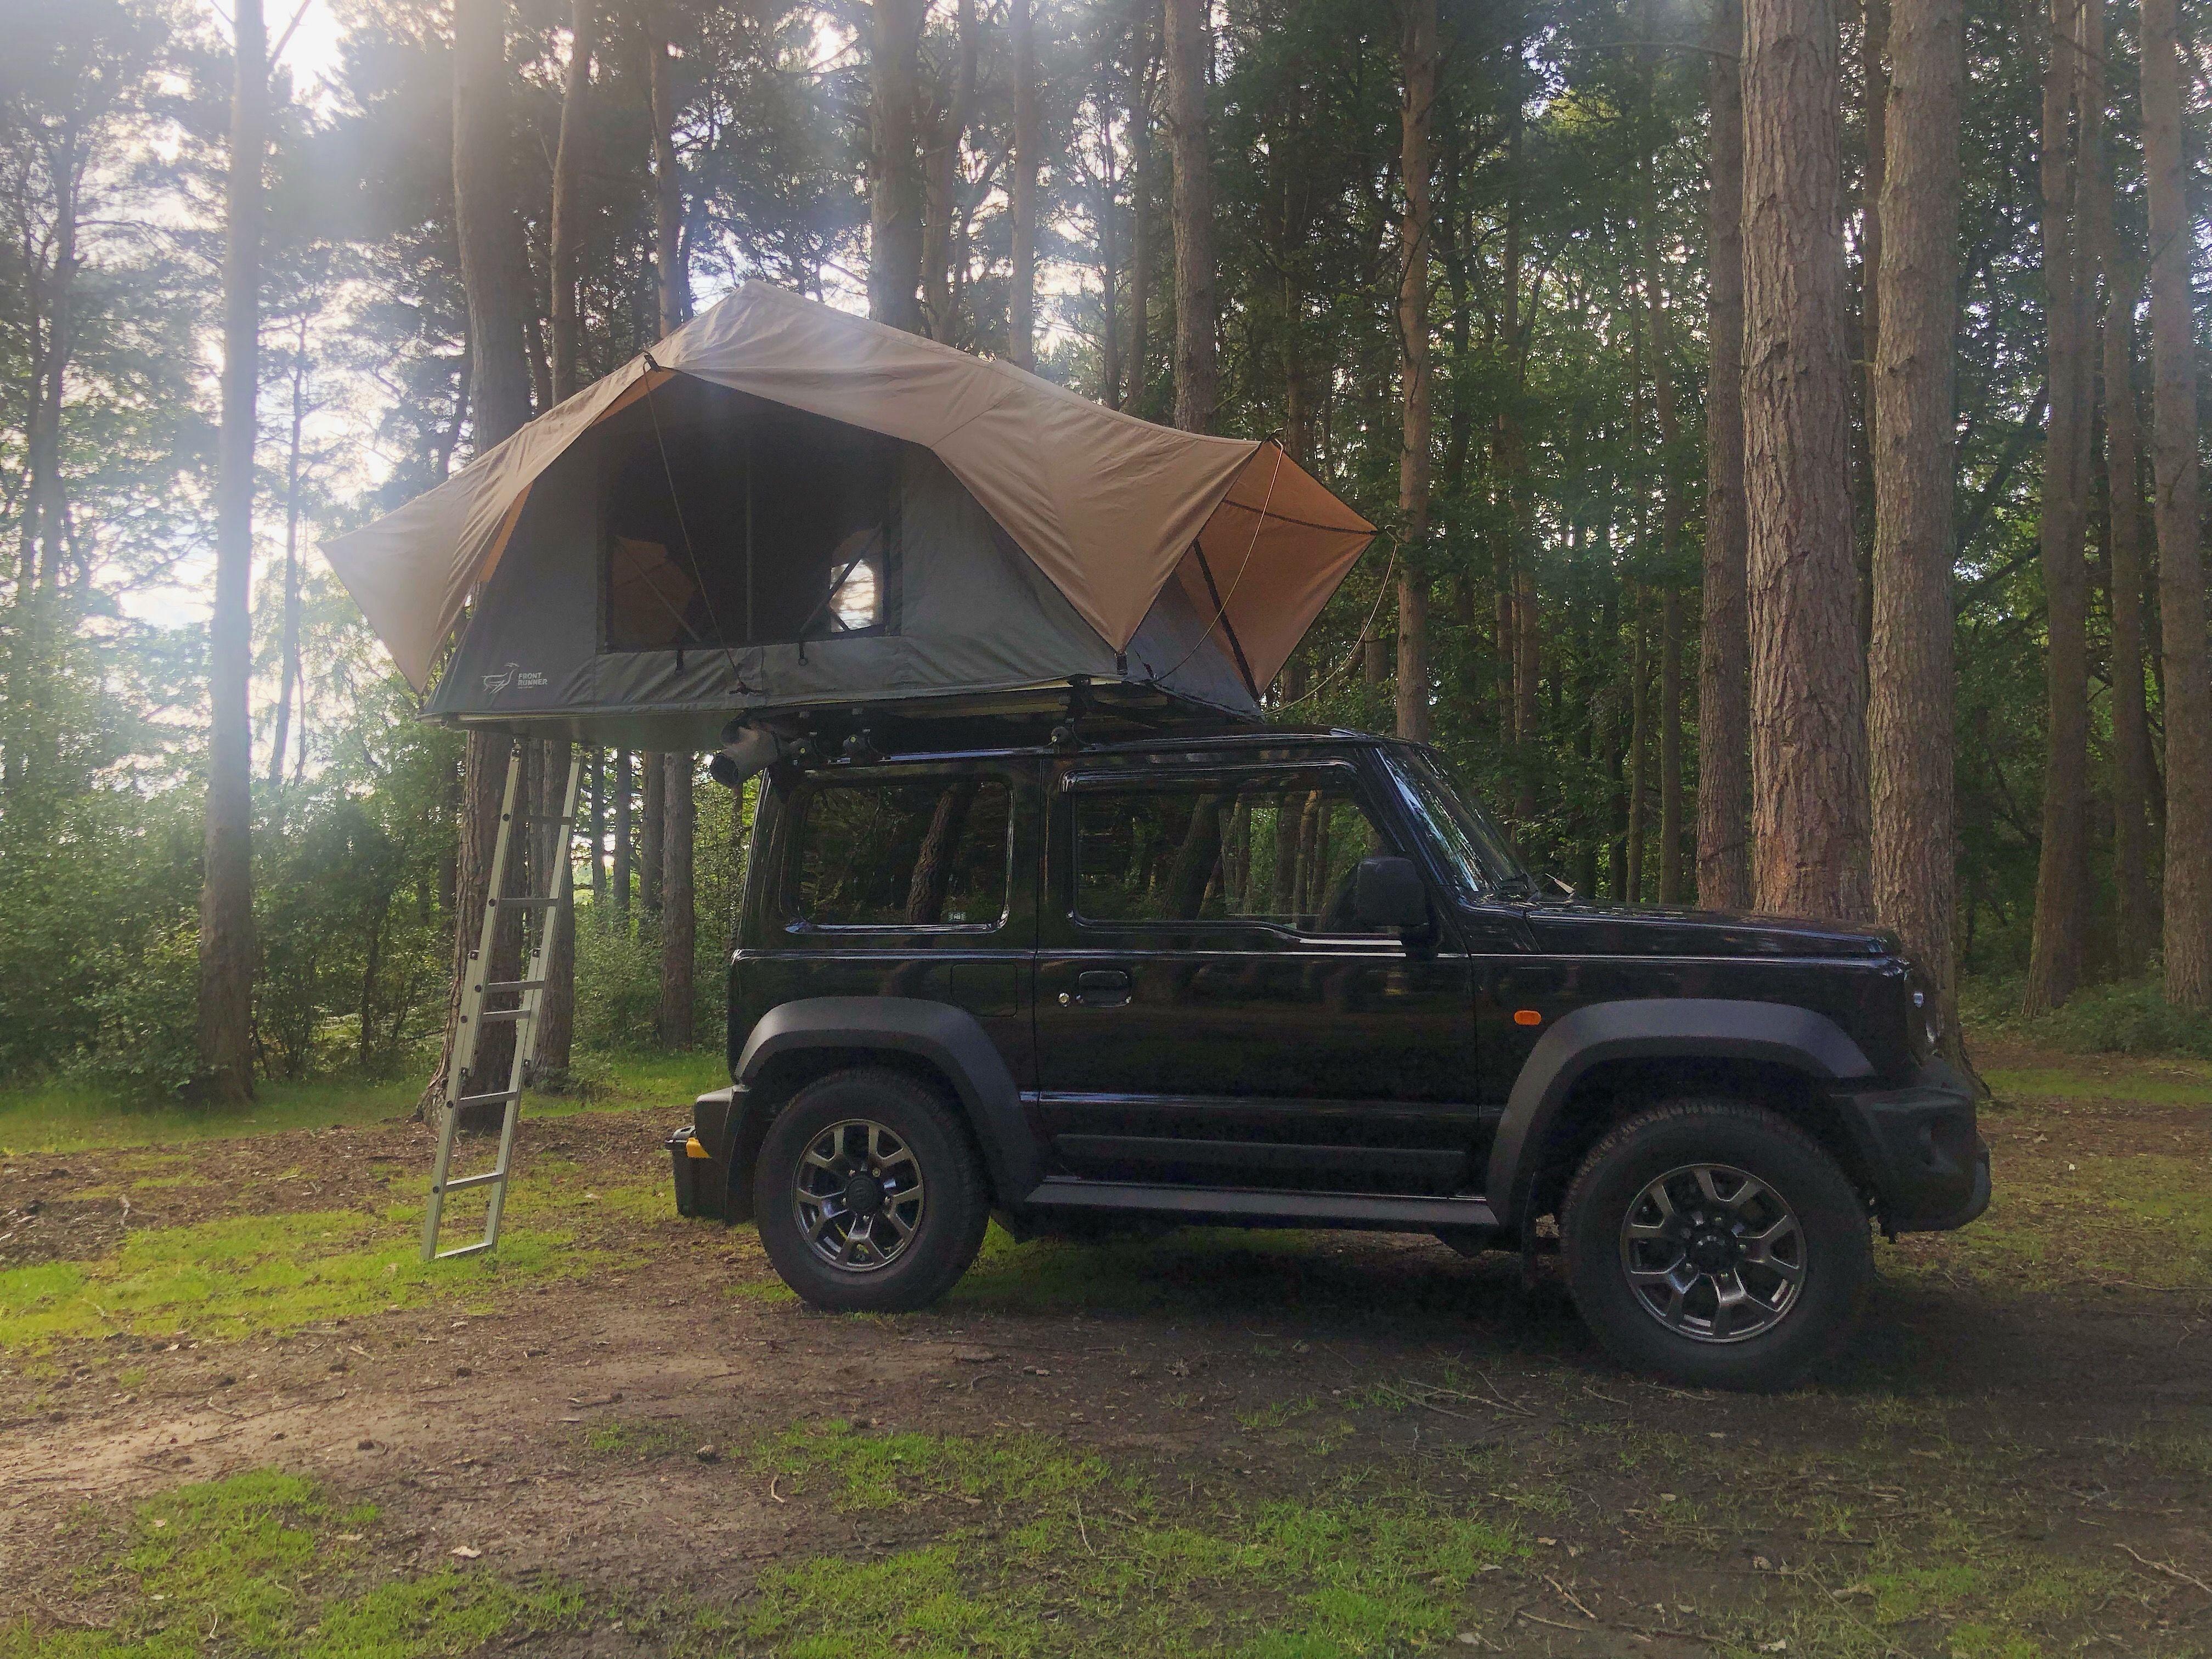 Suzuki Jimny Roof Tent Roof Tent Suzuki Jimny Tent